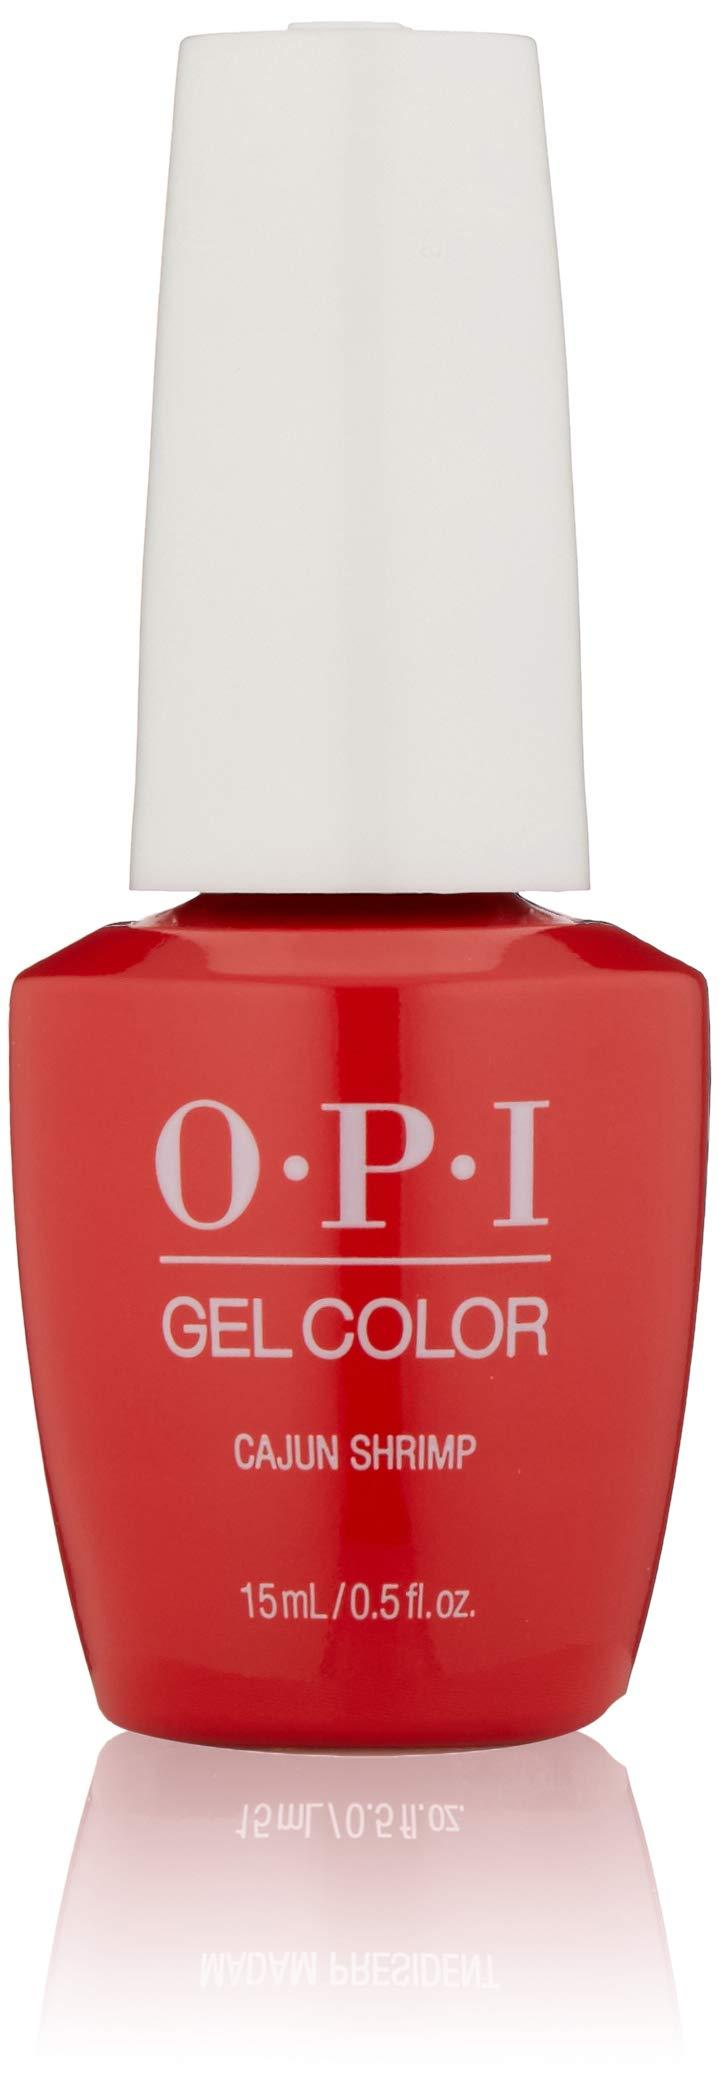 OPI GelColor Nail Polish, Red Gel Nail Polish, Cajun Shrimp, 0.5 floz